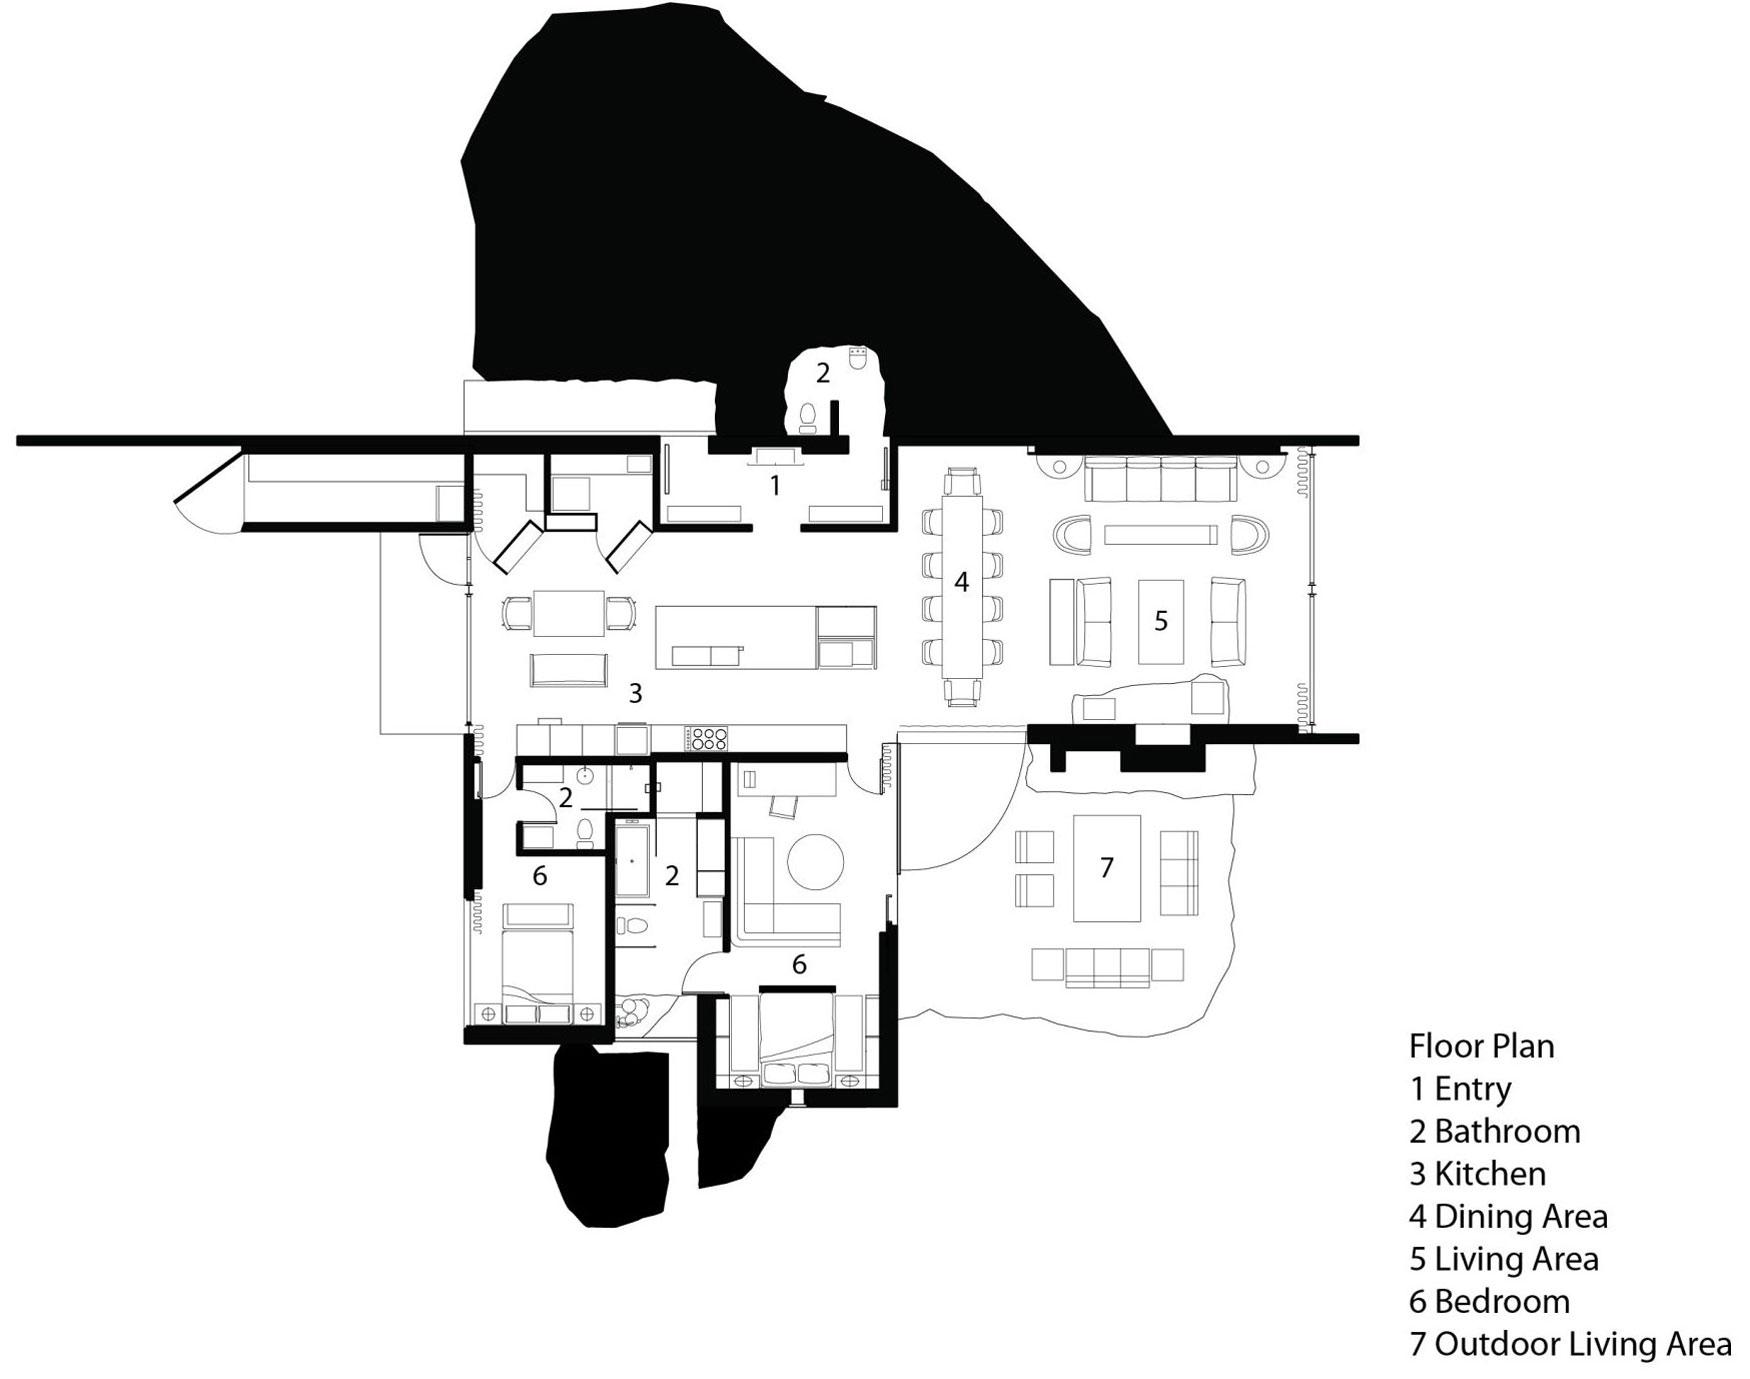 Floor Plan, The Pierre on San Juan Island by Olson Kundig Architects